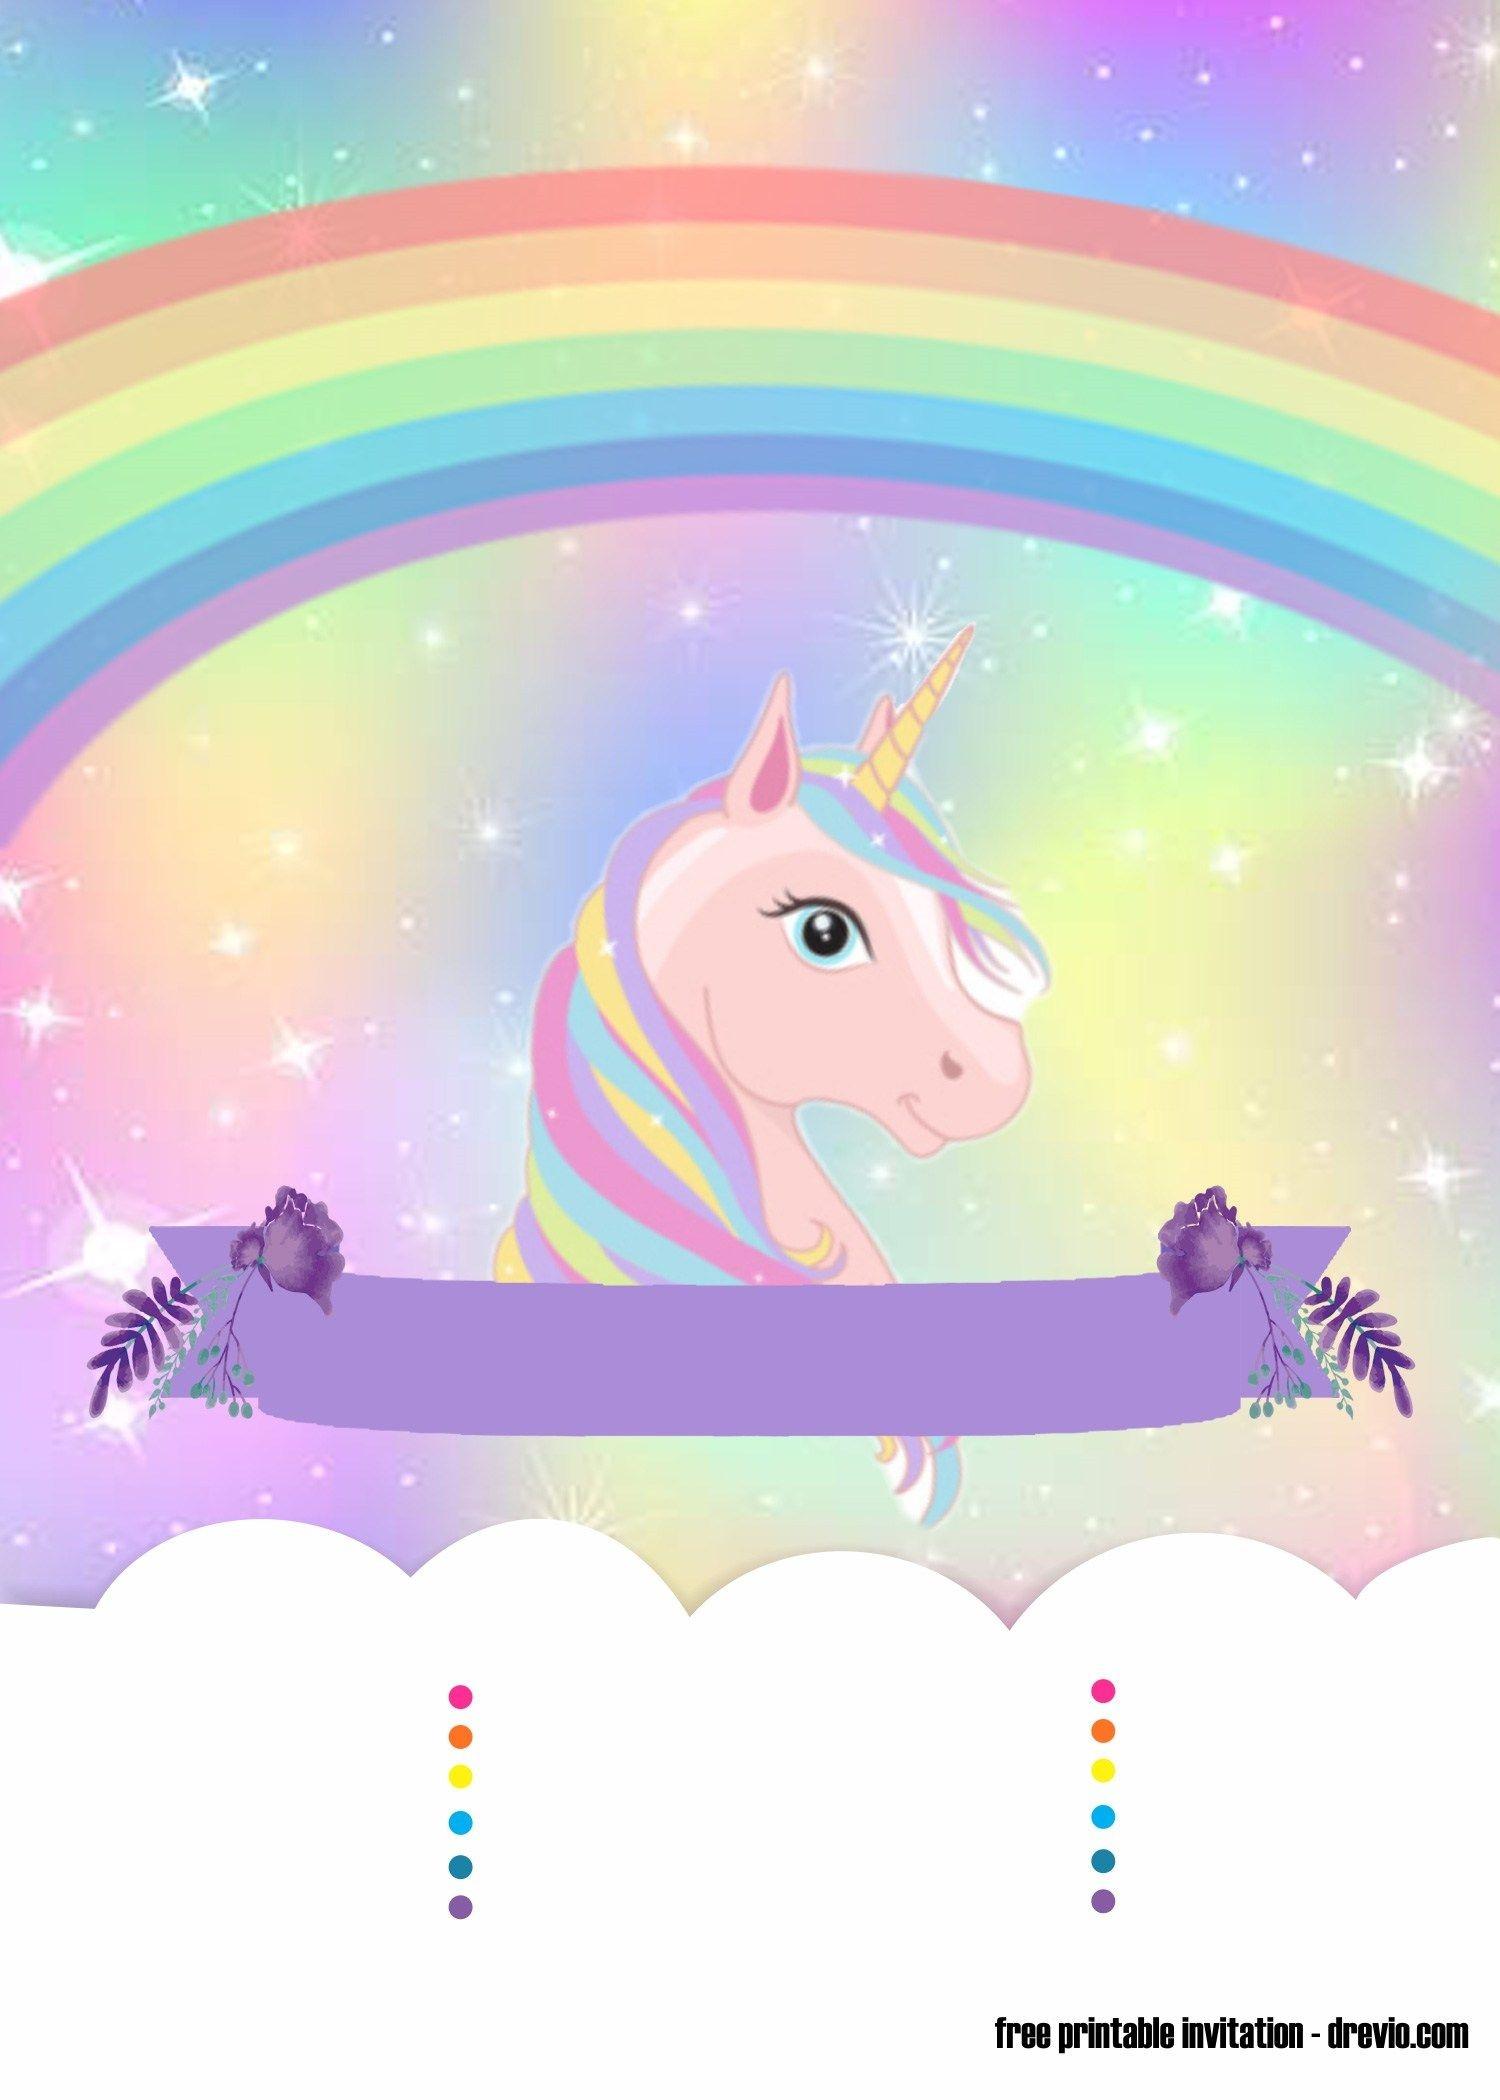 Sweet Party With Rainbow Unicorn Invitation Template - Free - Free Printable Rainbow Unicorn Invitations